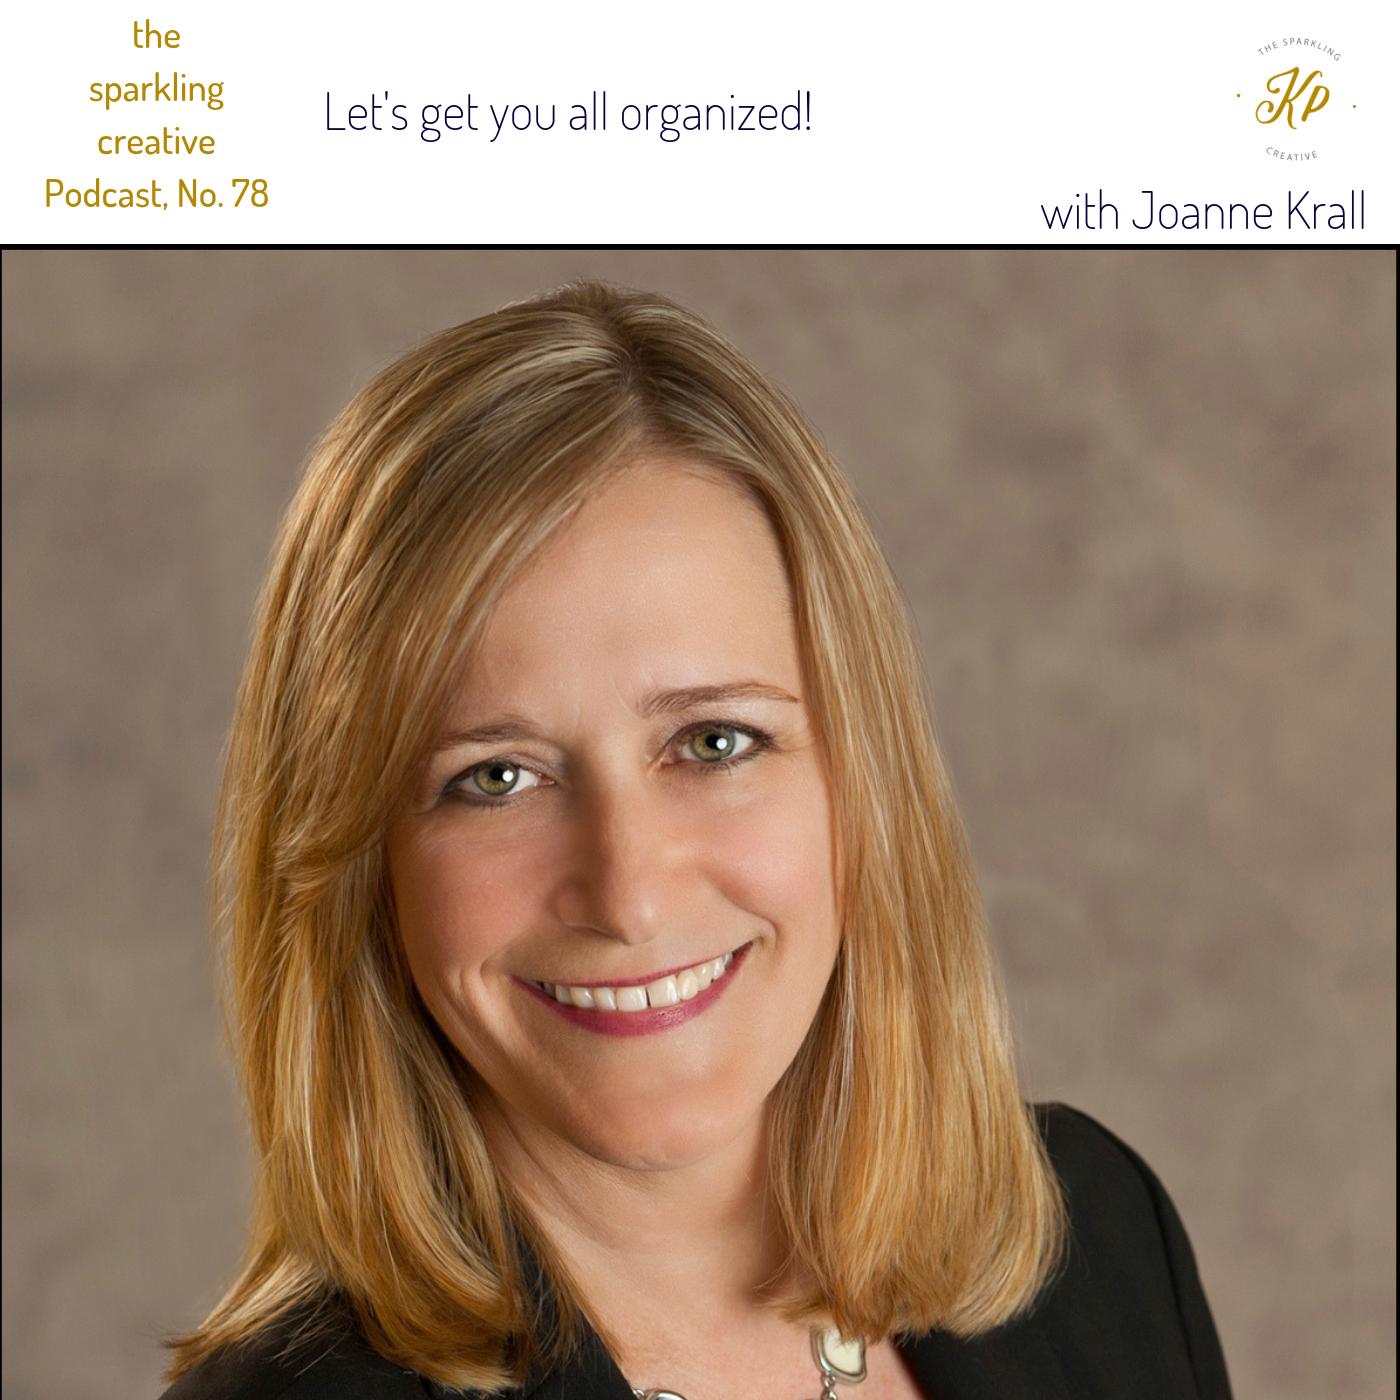 the sparkling creative Podcast, Episode 78: Let's get you all organized!   with Joanne Krall, www.kerstinpressler.com/blog-2/episode78